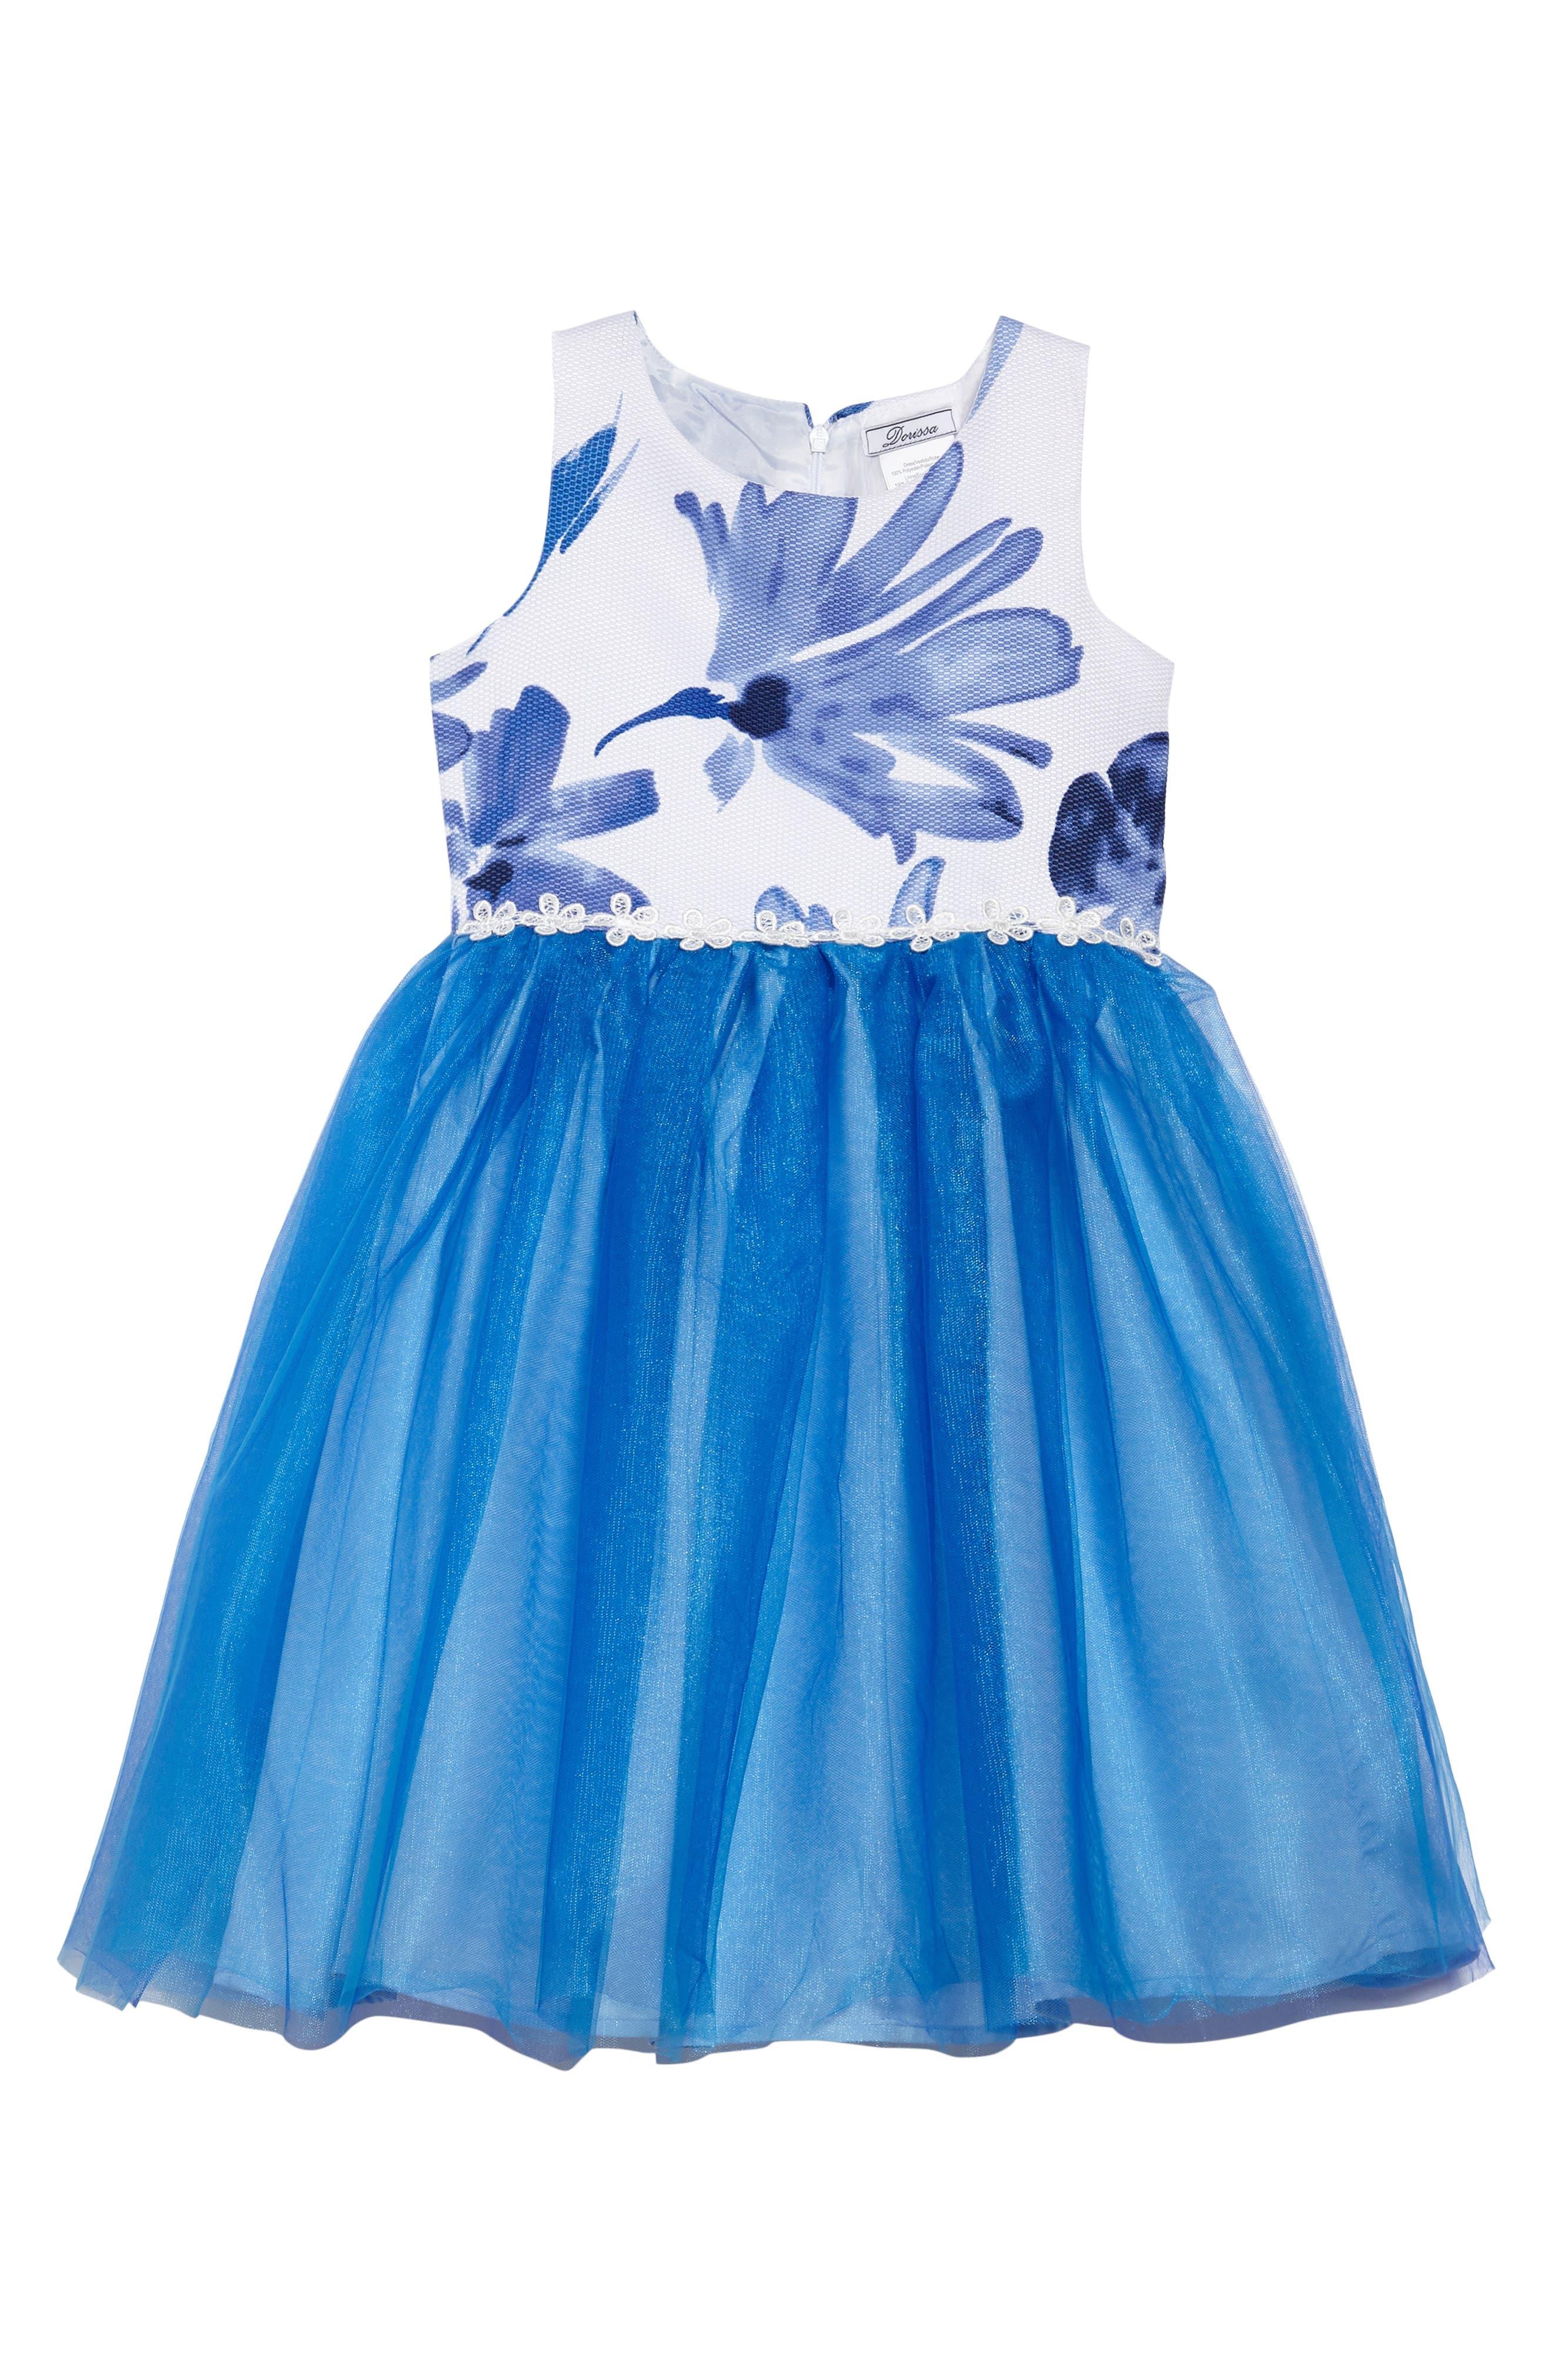 Kathy Sleeveless Dress,                             Main thumbnail 1, color,                             Blue/ White